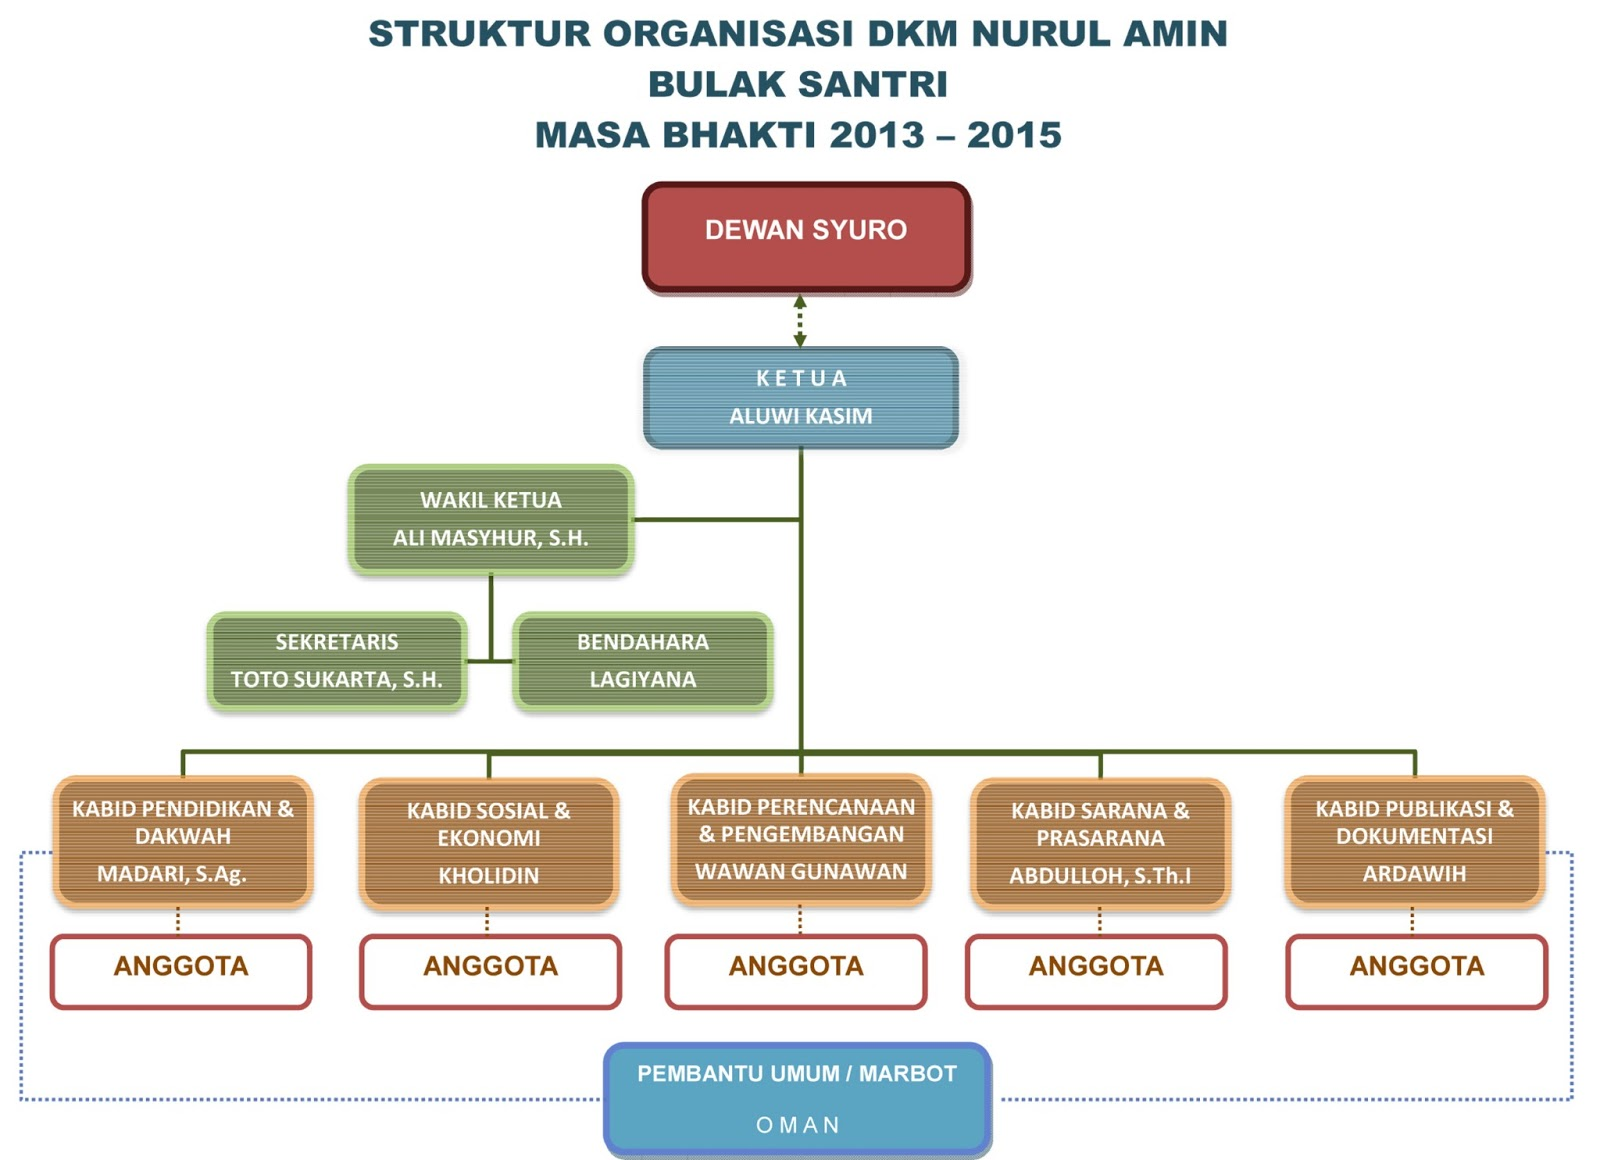 Masjid Nurul Amin-Bulak Santri: STRUKTUR ORGANISASI